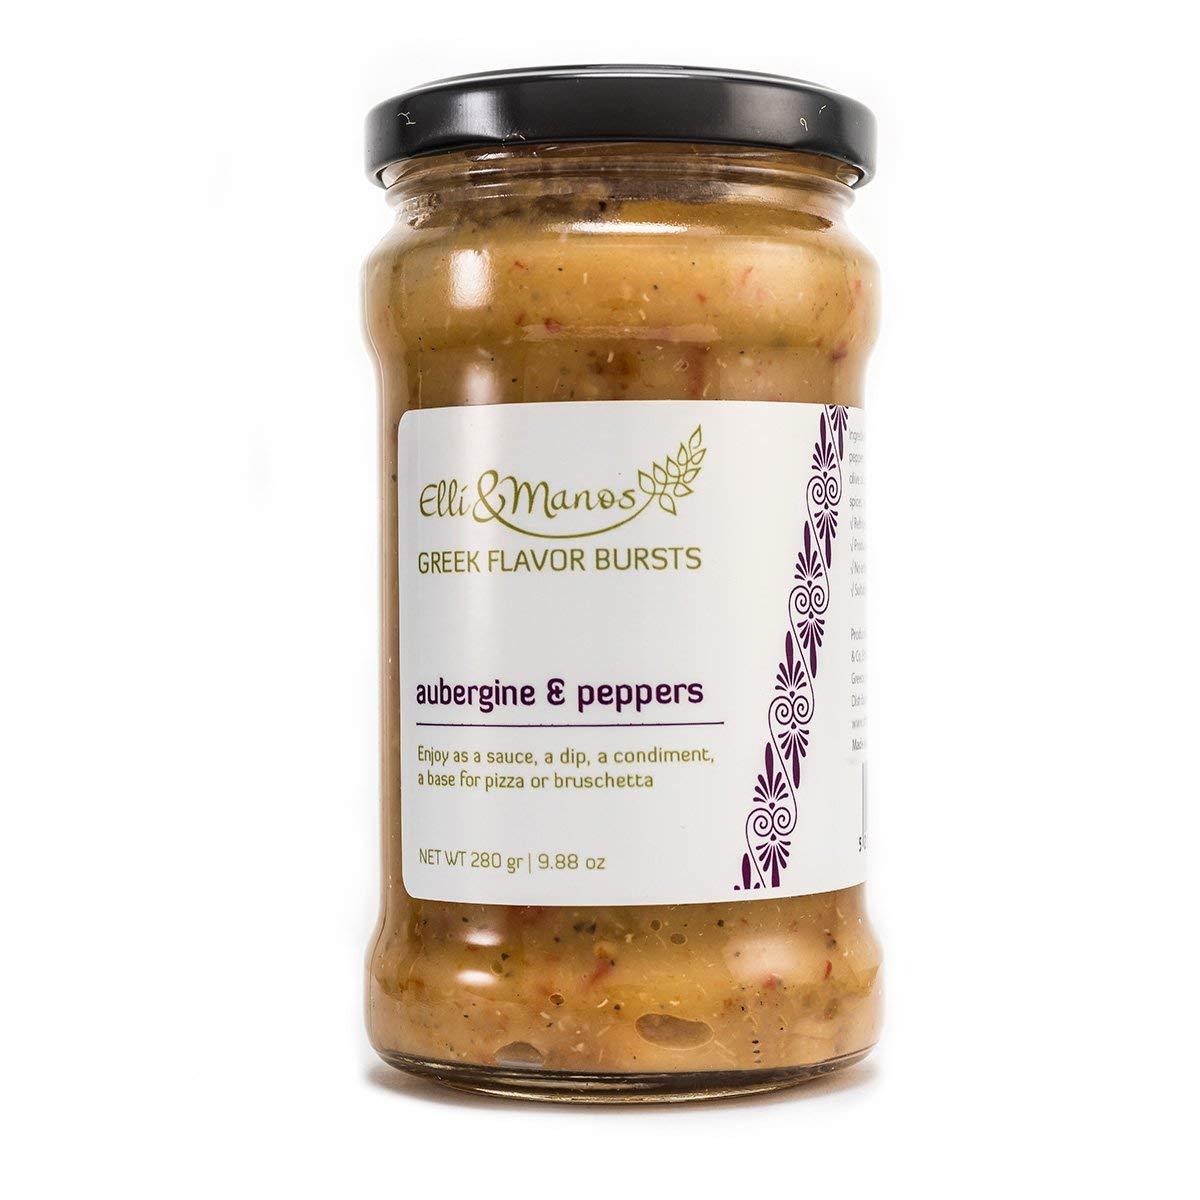 Elli & Manos Greek Flavor Bursts - Aubergine (Eggplant) & Peppers - 280gr/9.88oz - highly concentrated spread/veggie dip by Elli & Manos